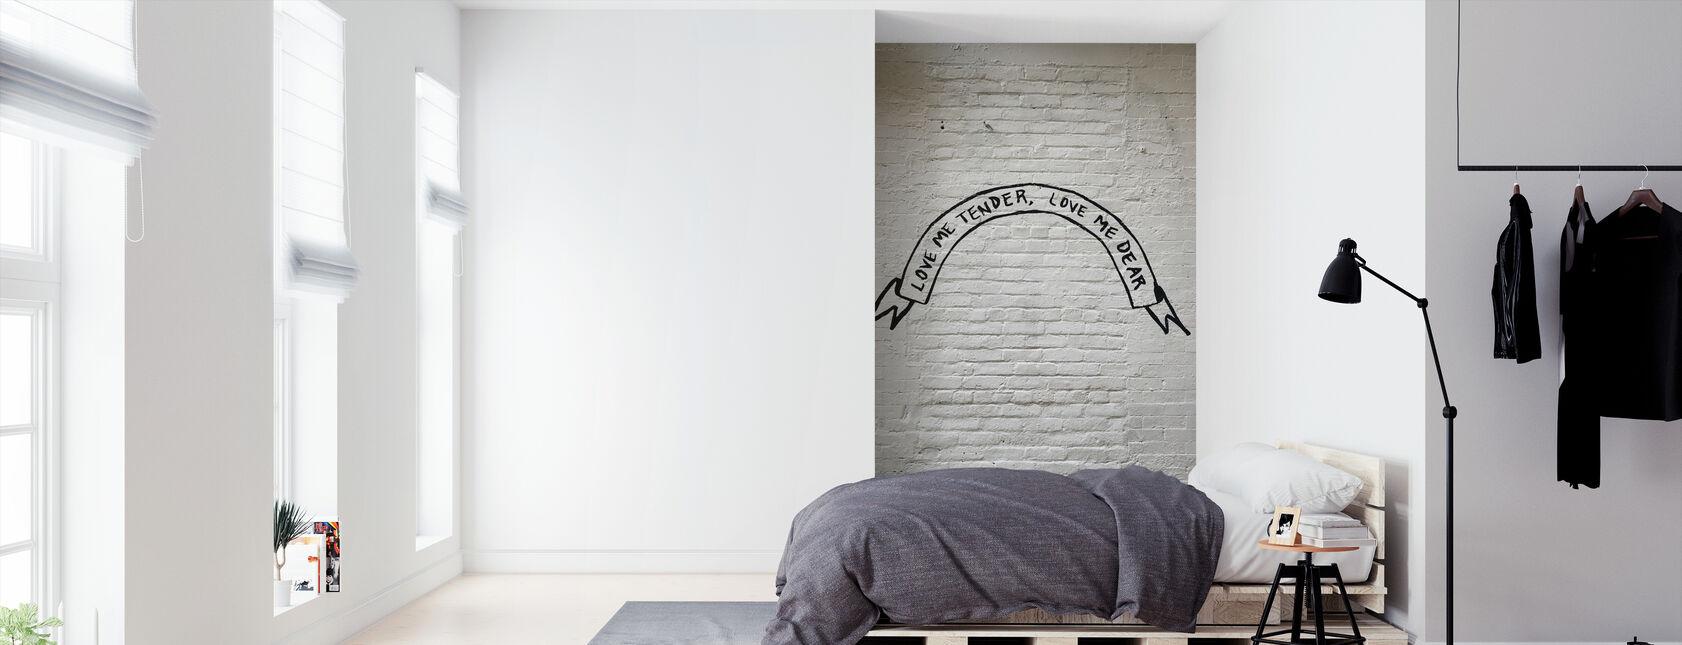 Wandkalligrafie - Behang - Slaapkamer